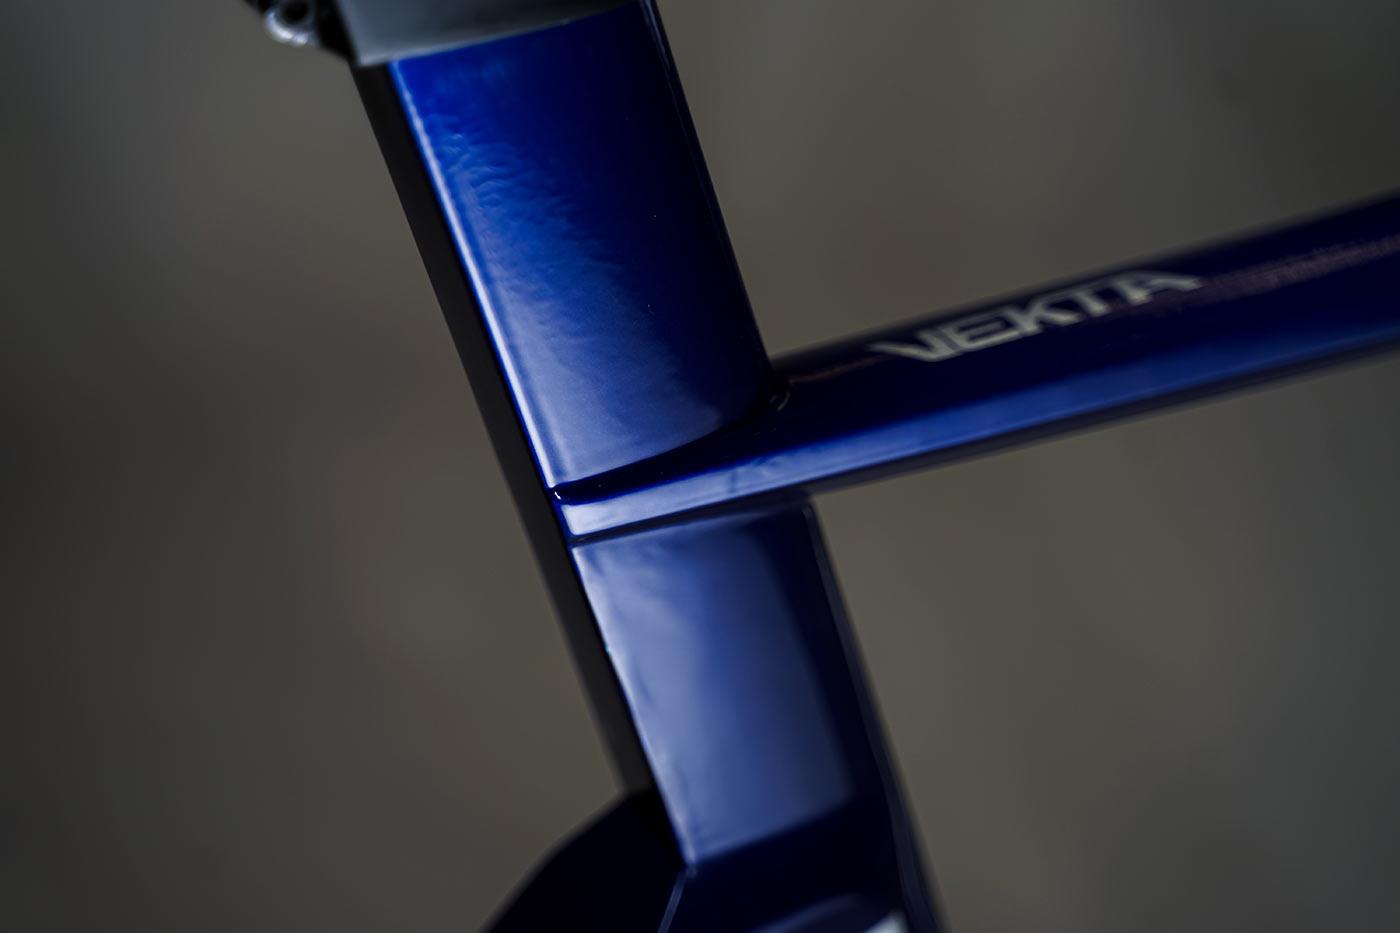 reap vekta aero road bike closeup frame details of seat tube and seat mast